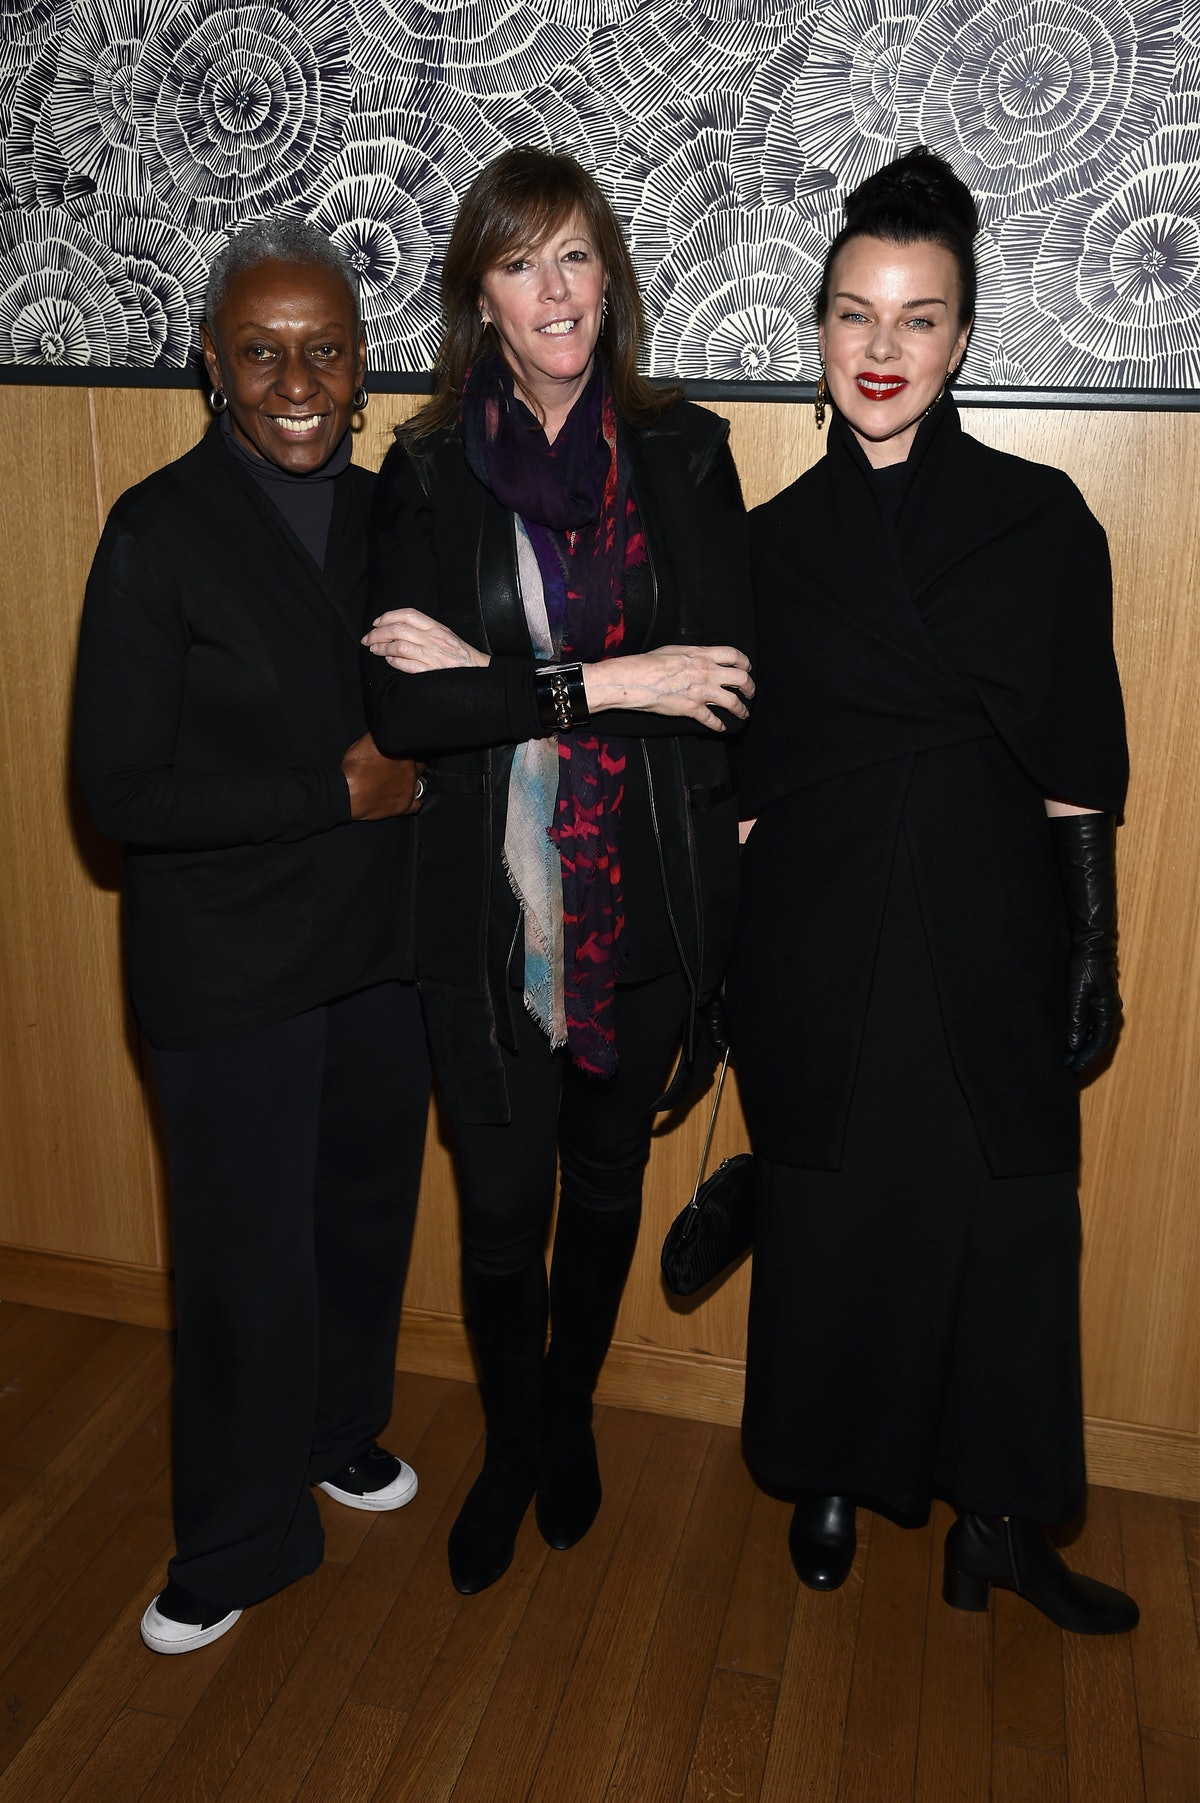 Bethann Hardison, Jane Rosenthal, and Debi Mazar